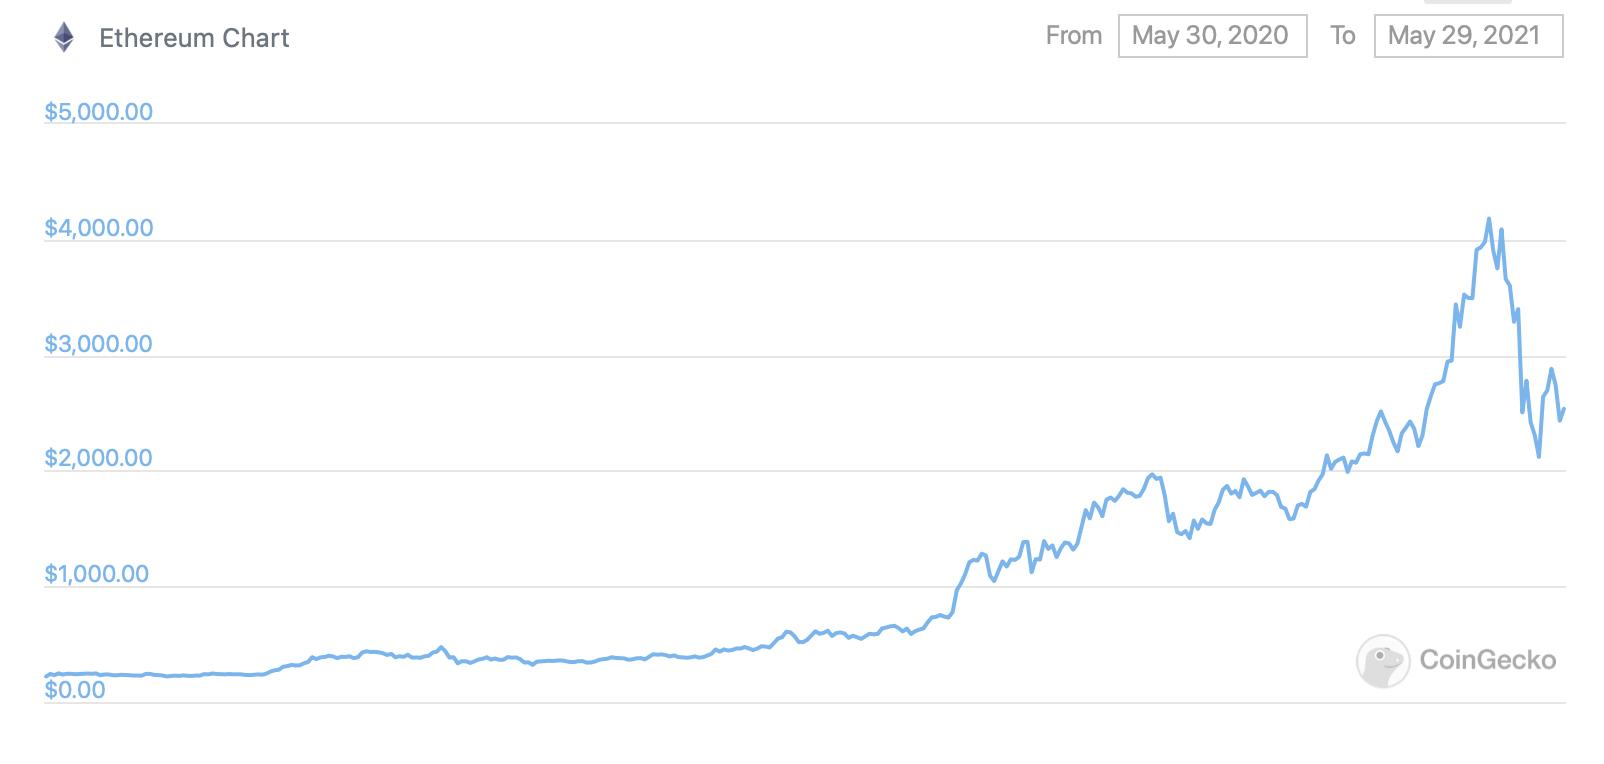 график эфириум курс